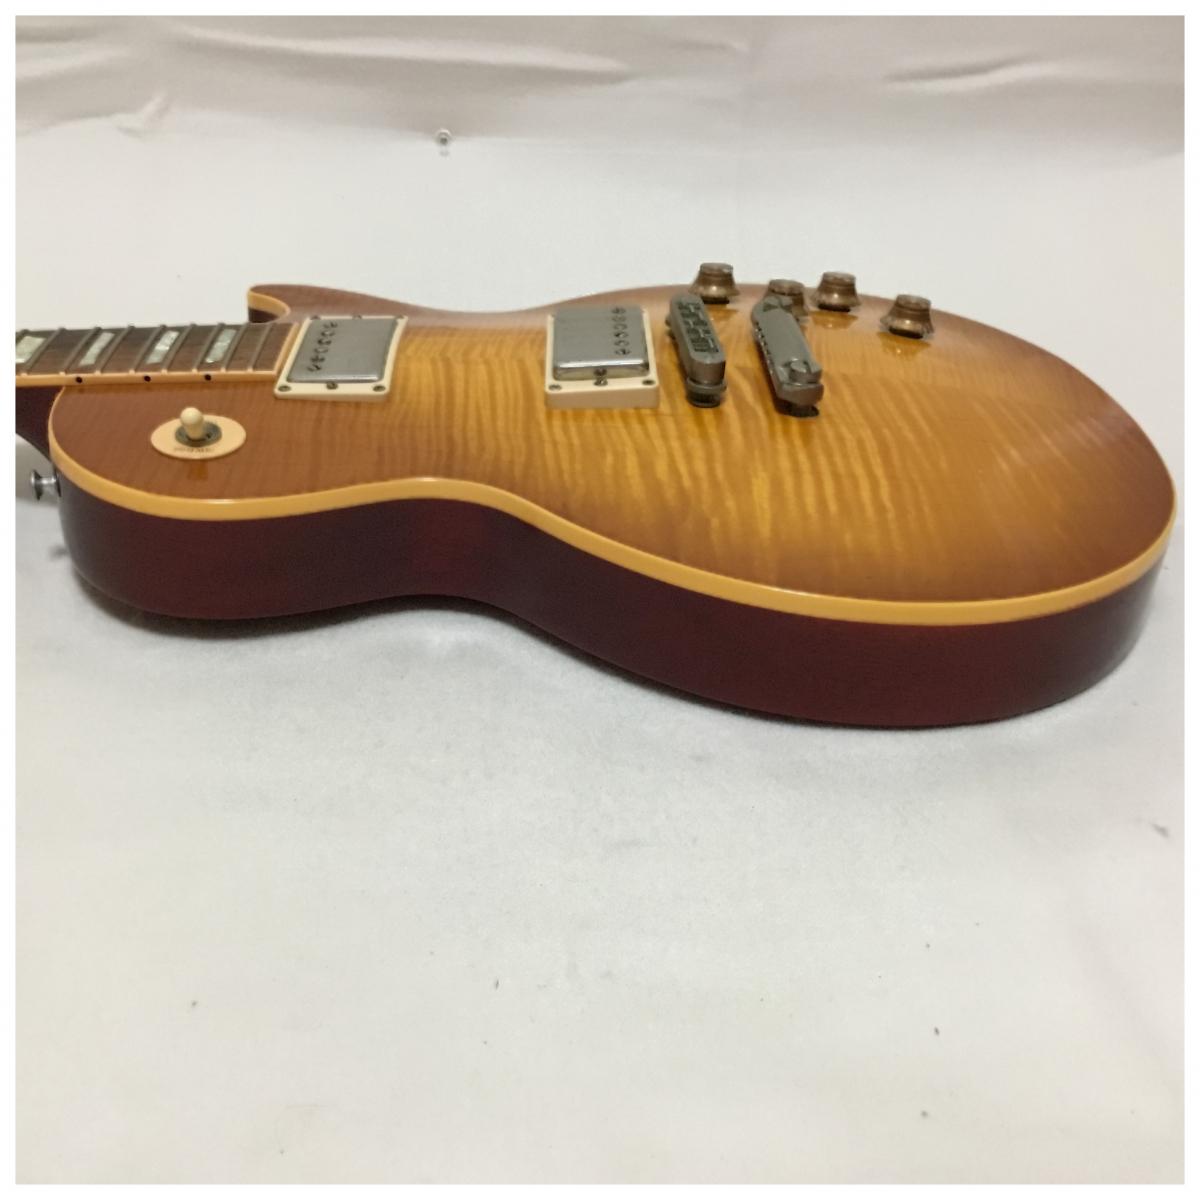 GIBSON ギブソン USA LesPaul Standard レスポール エレキギター 2004年製 ネック割れ_画像2